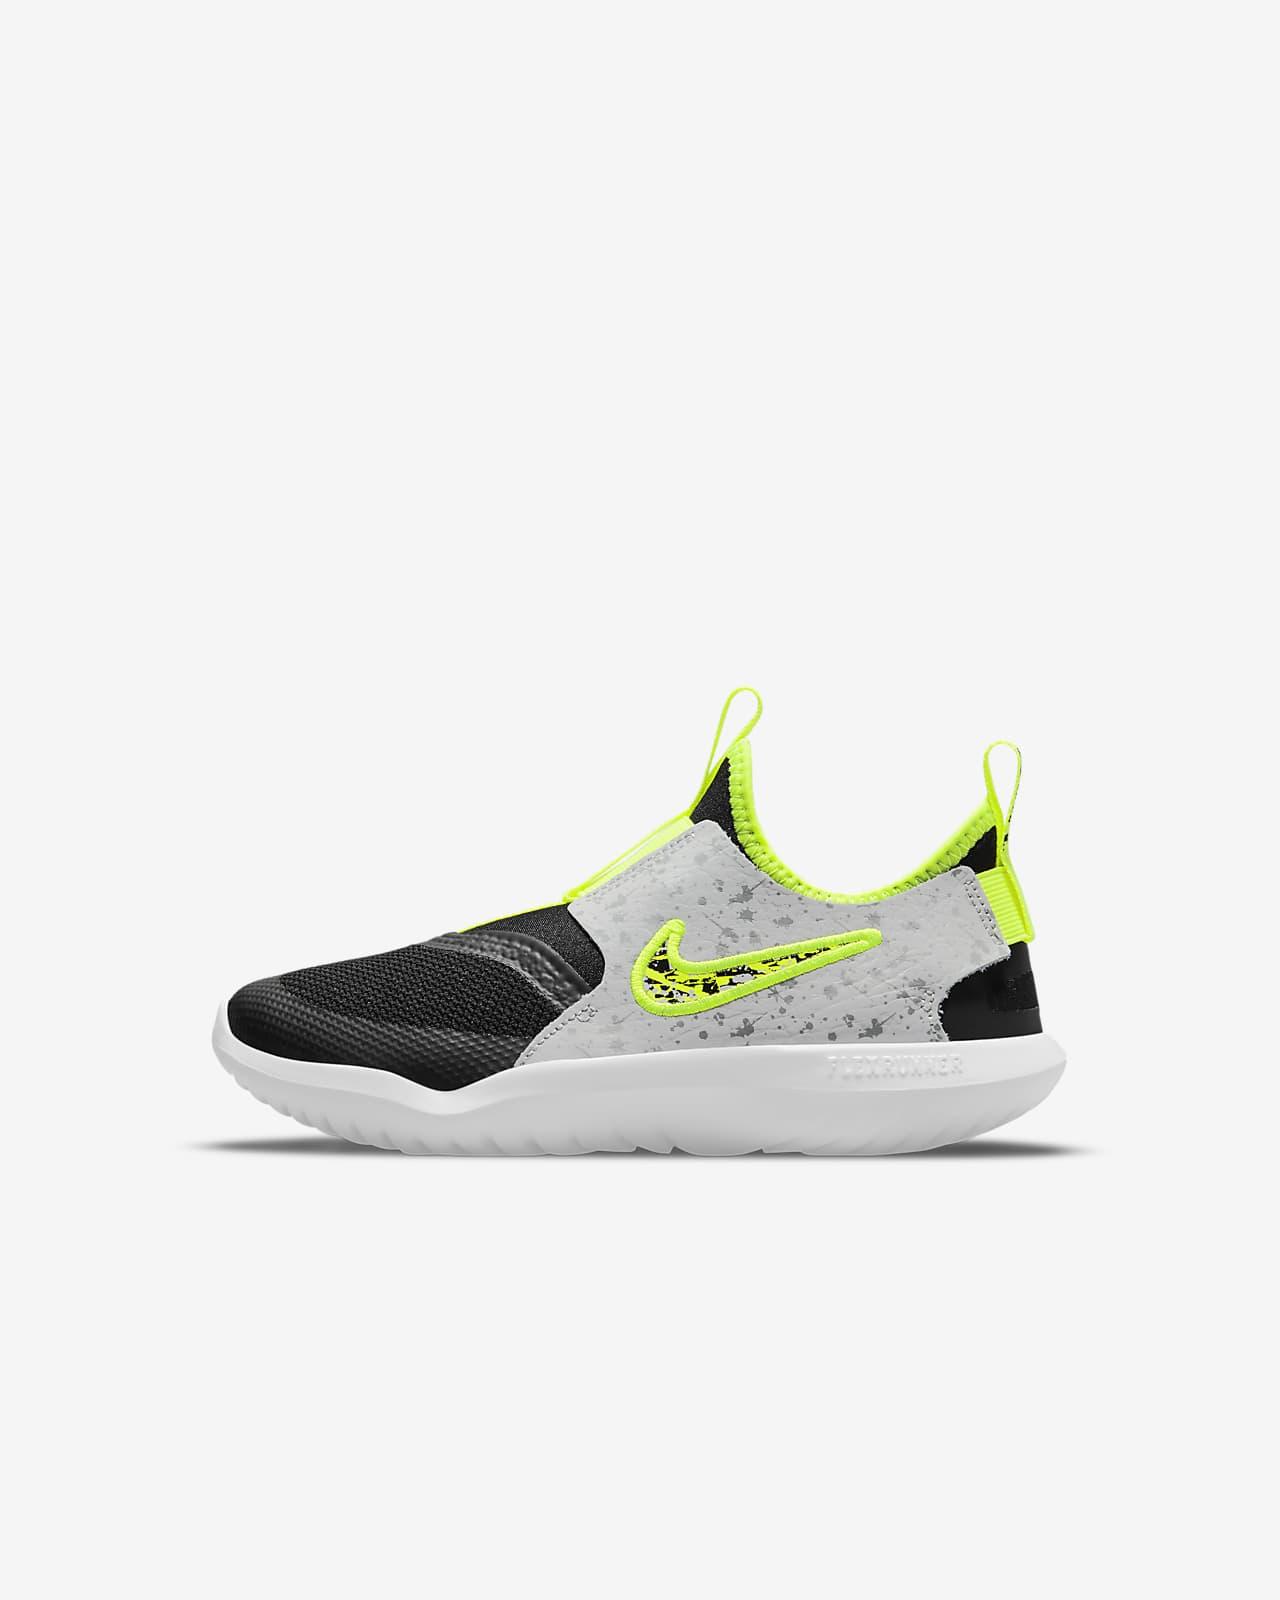 Nike Flex Runner Play Little Kids' Shoes